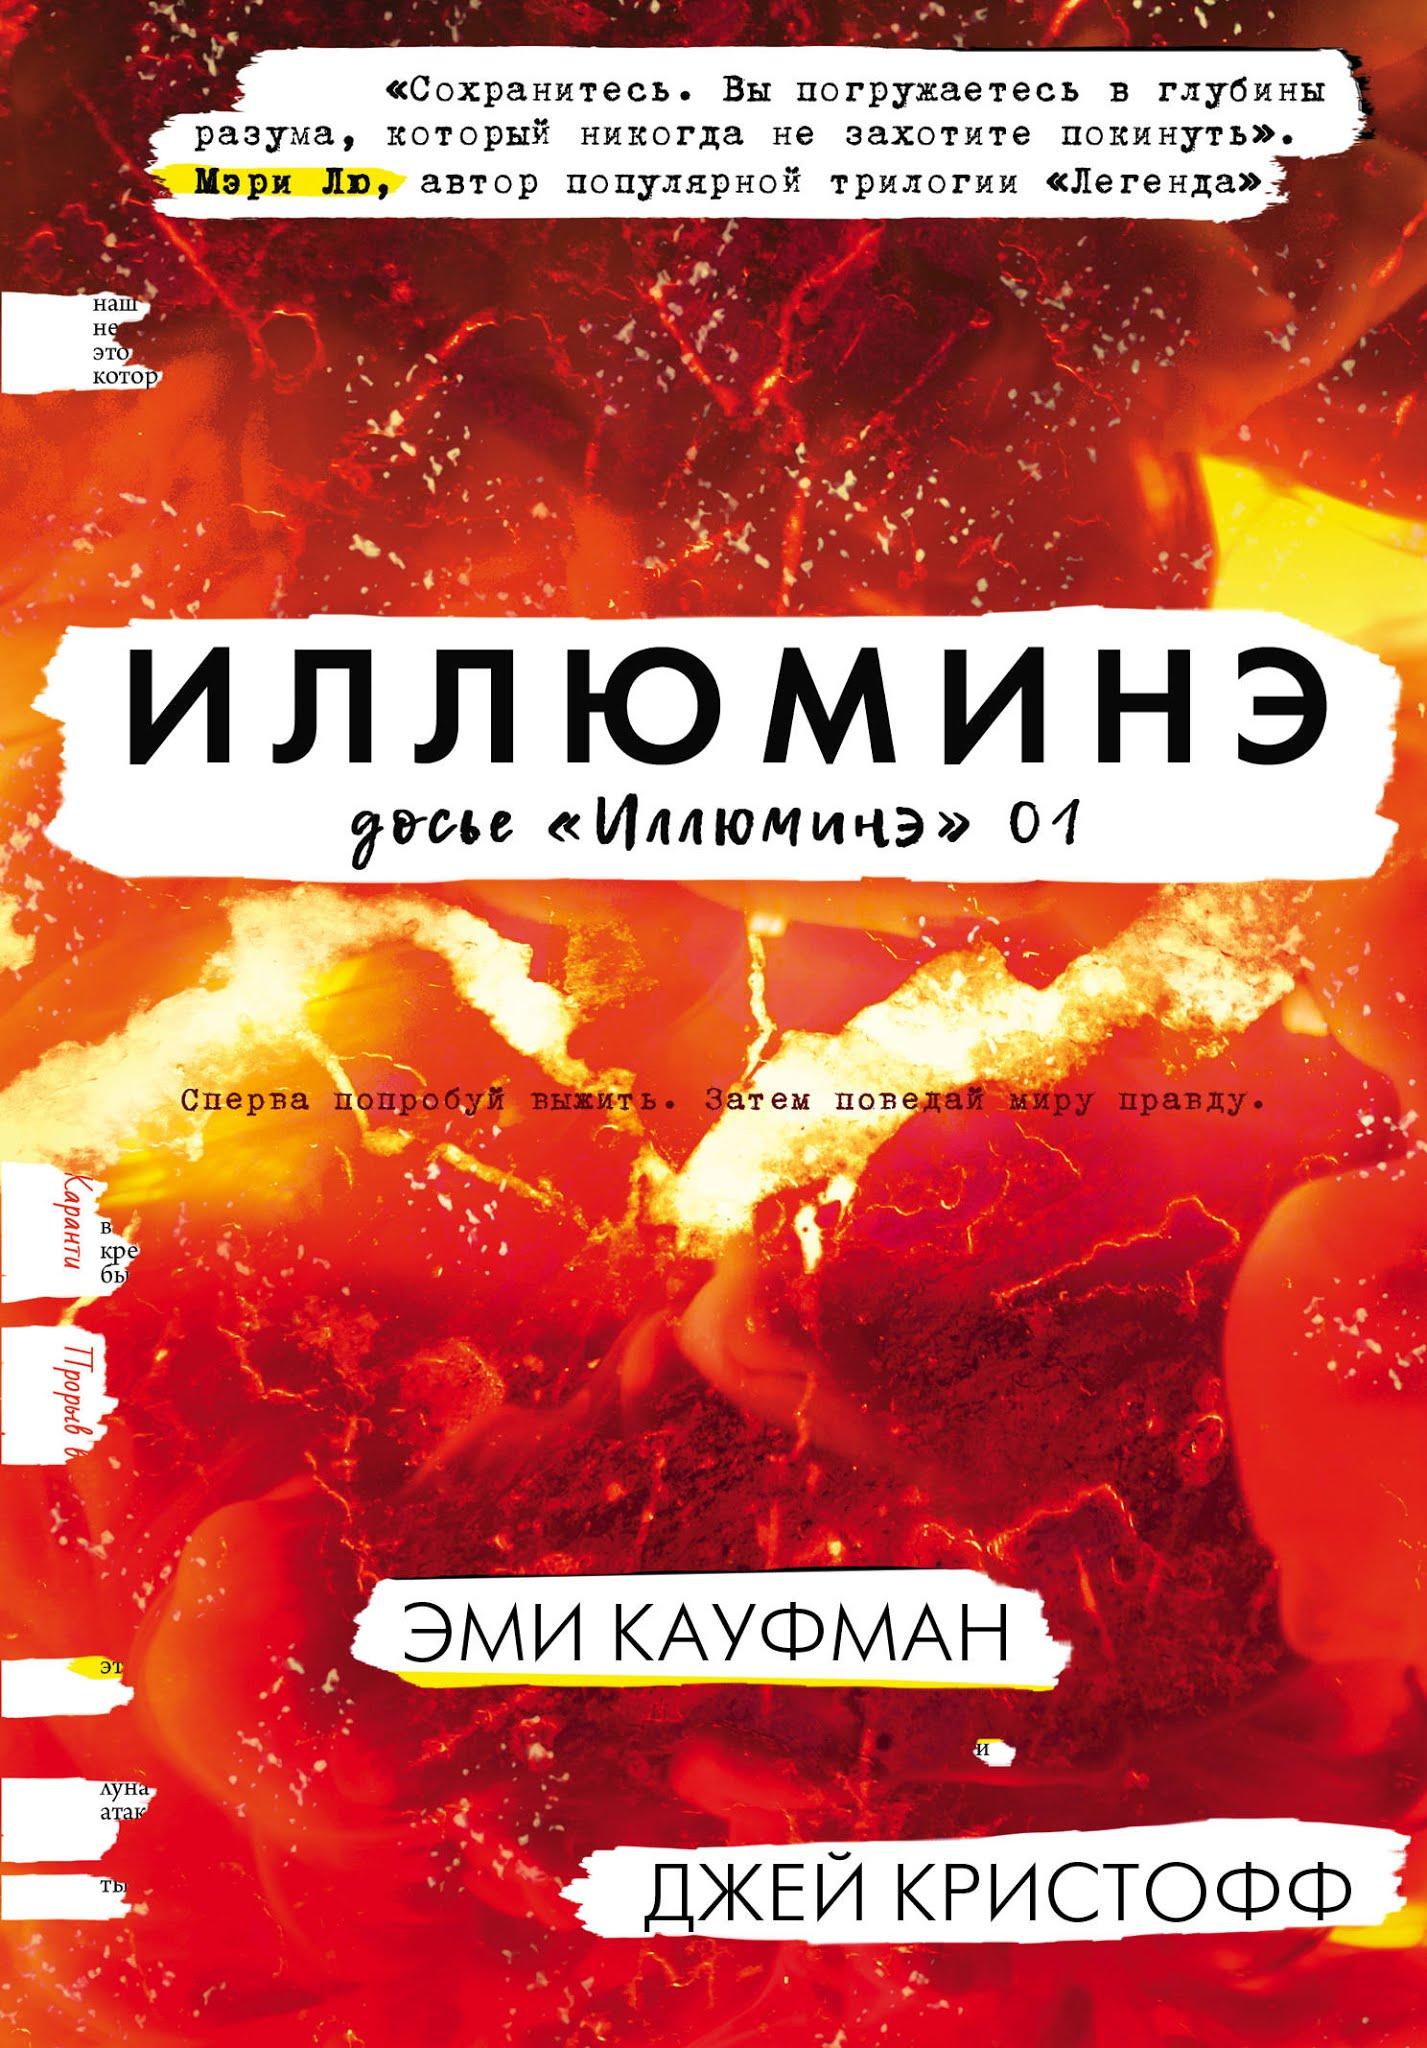 Эми Кауфман, Джей Кристофф — Иллюминэ (2015)